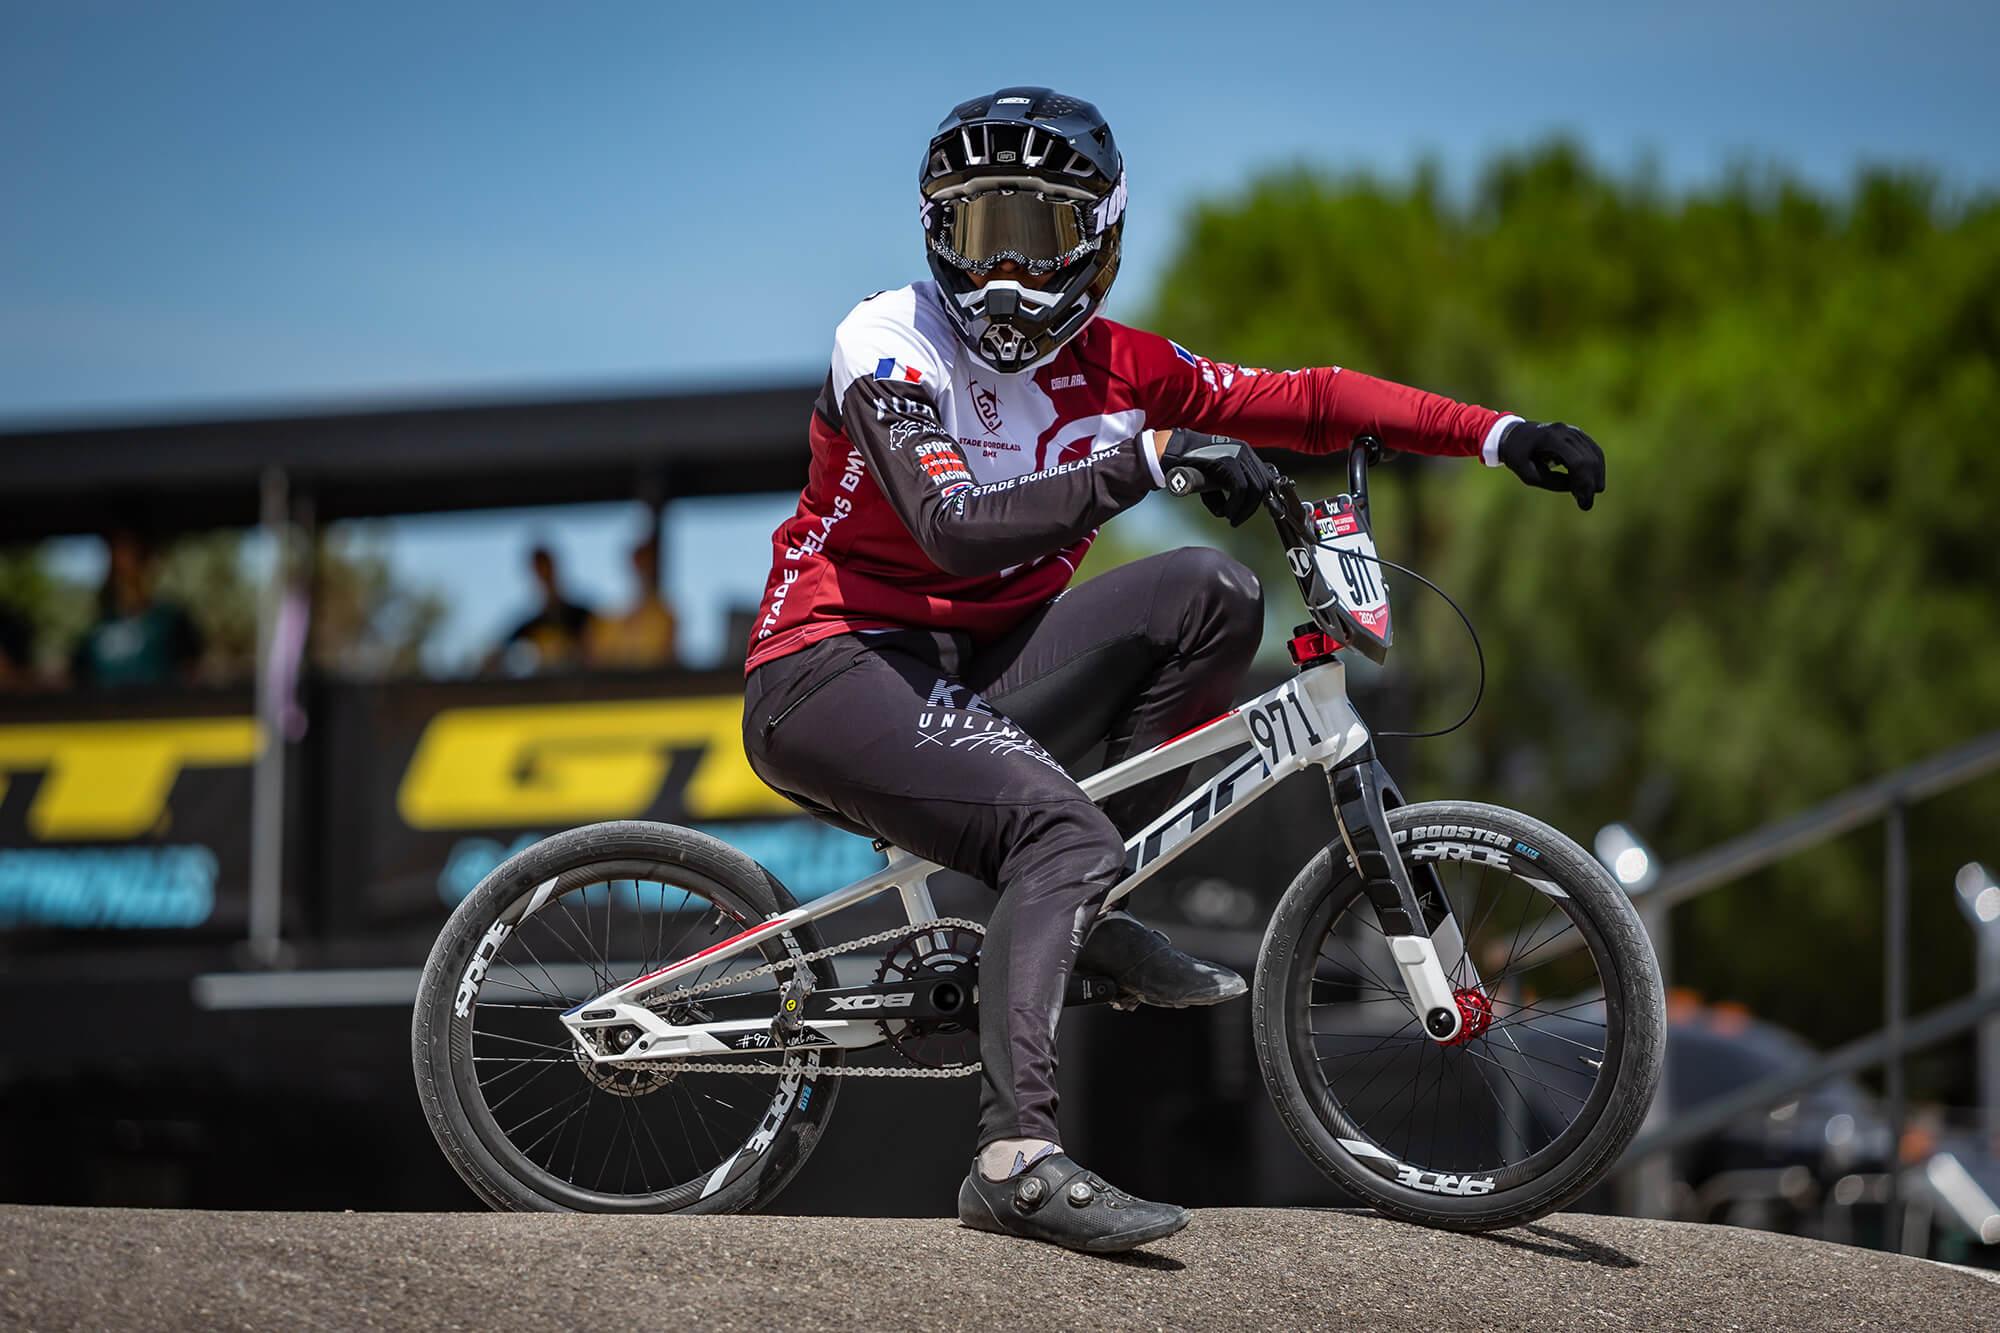 Manon Valentino Tokyo 2020 Olympic Bike - Nico van Dartel